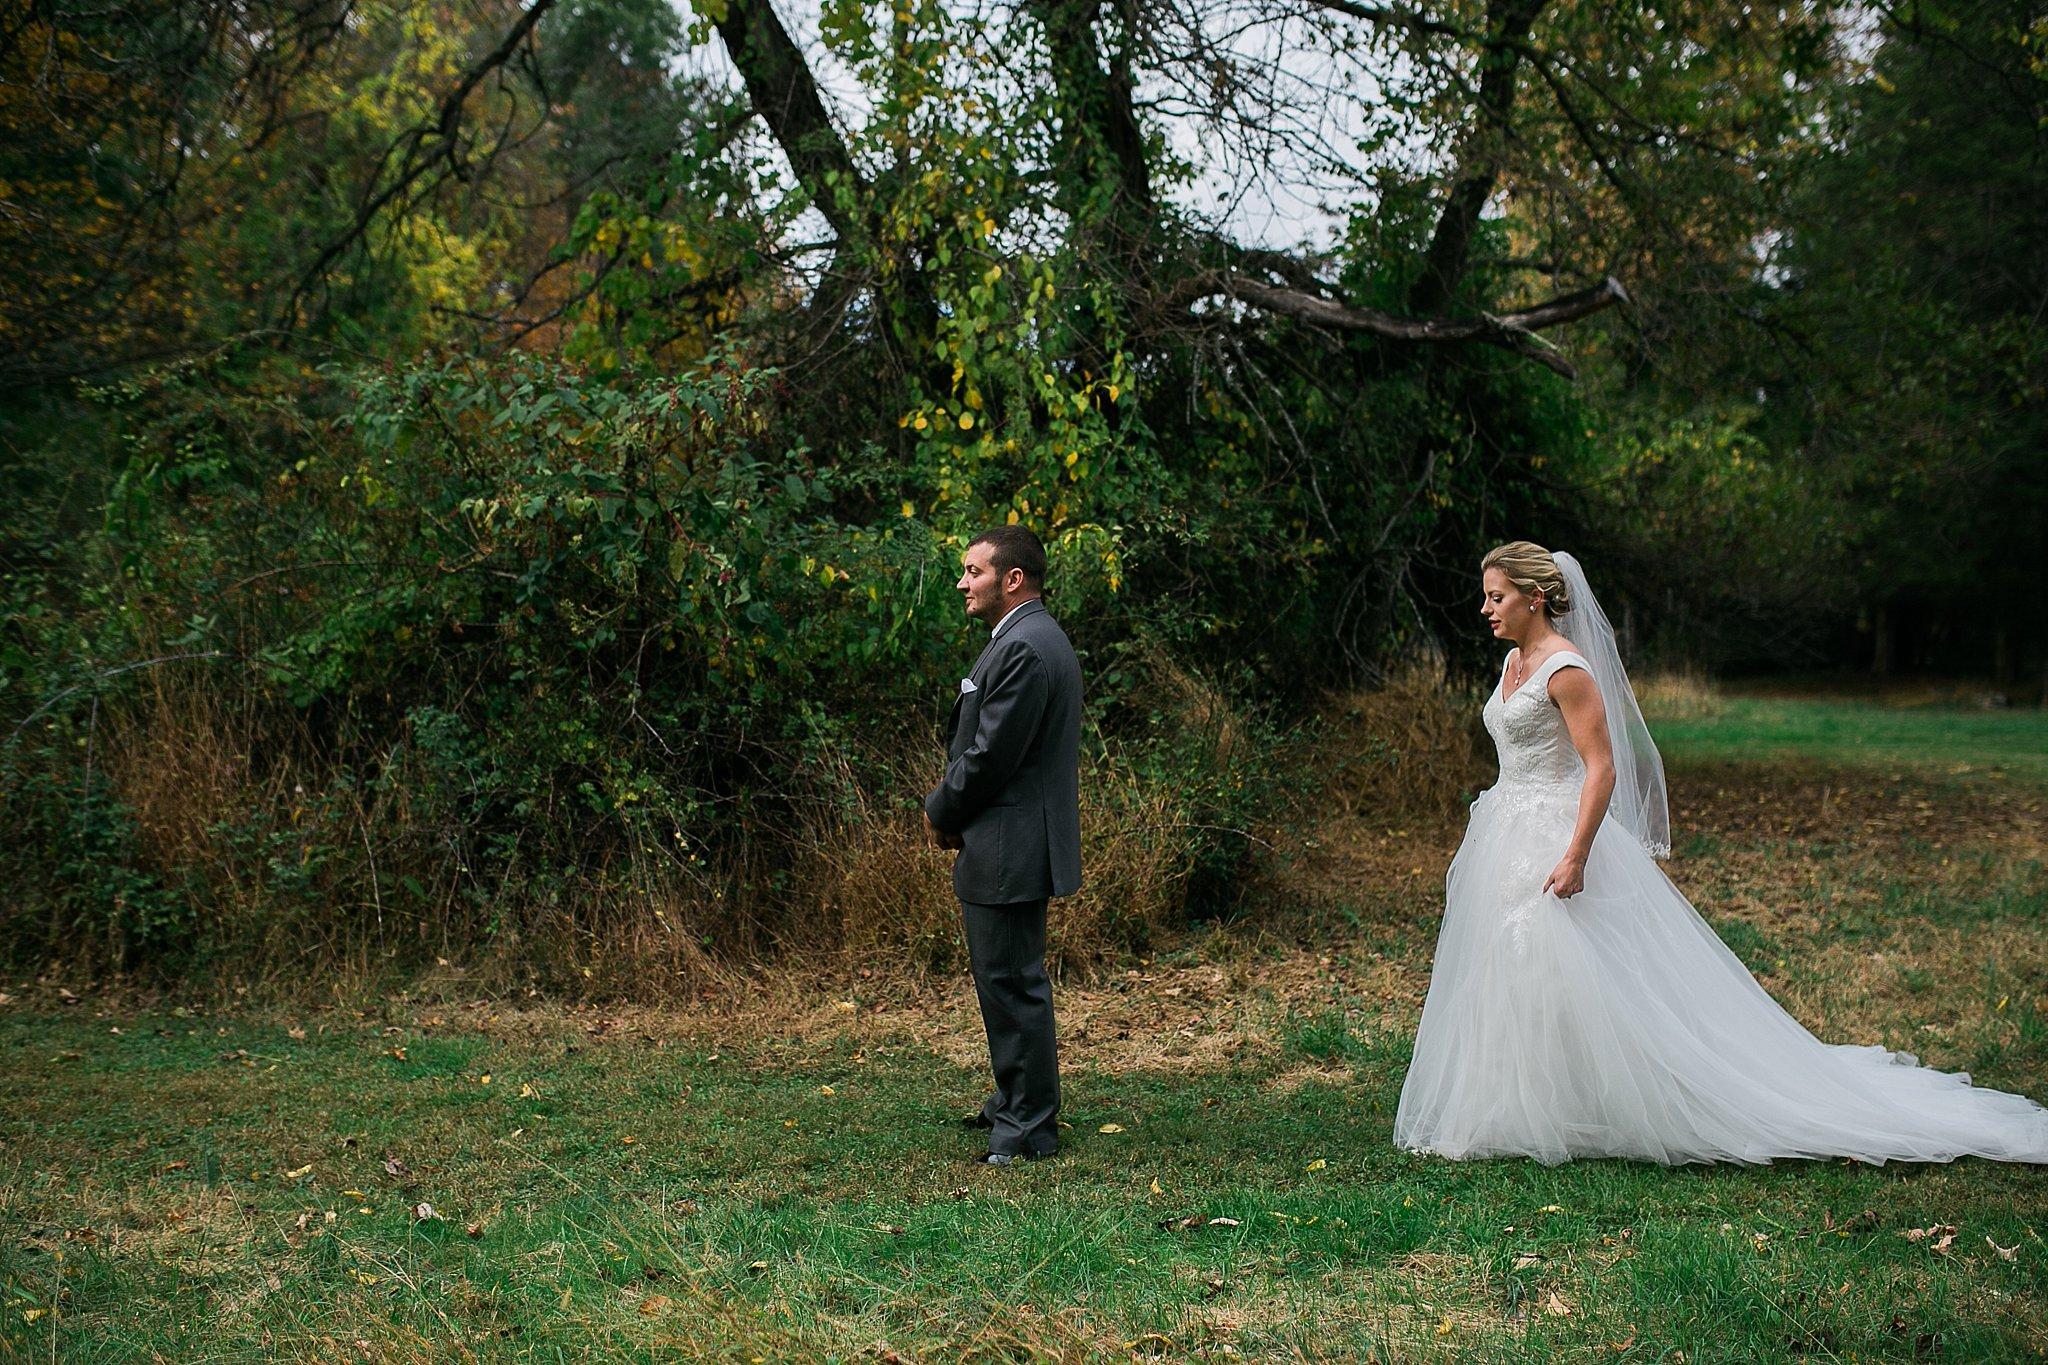 New Windsor New York Hudson Valley New York Wedding Photographer 17.jpg